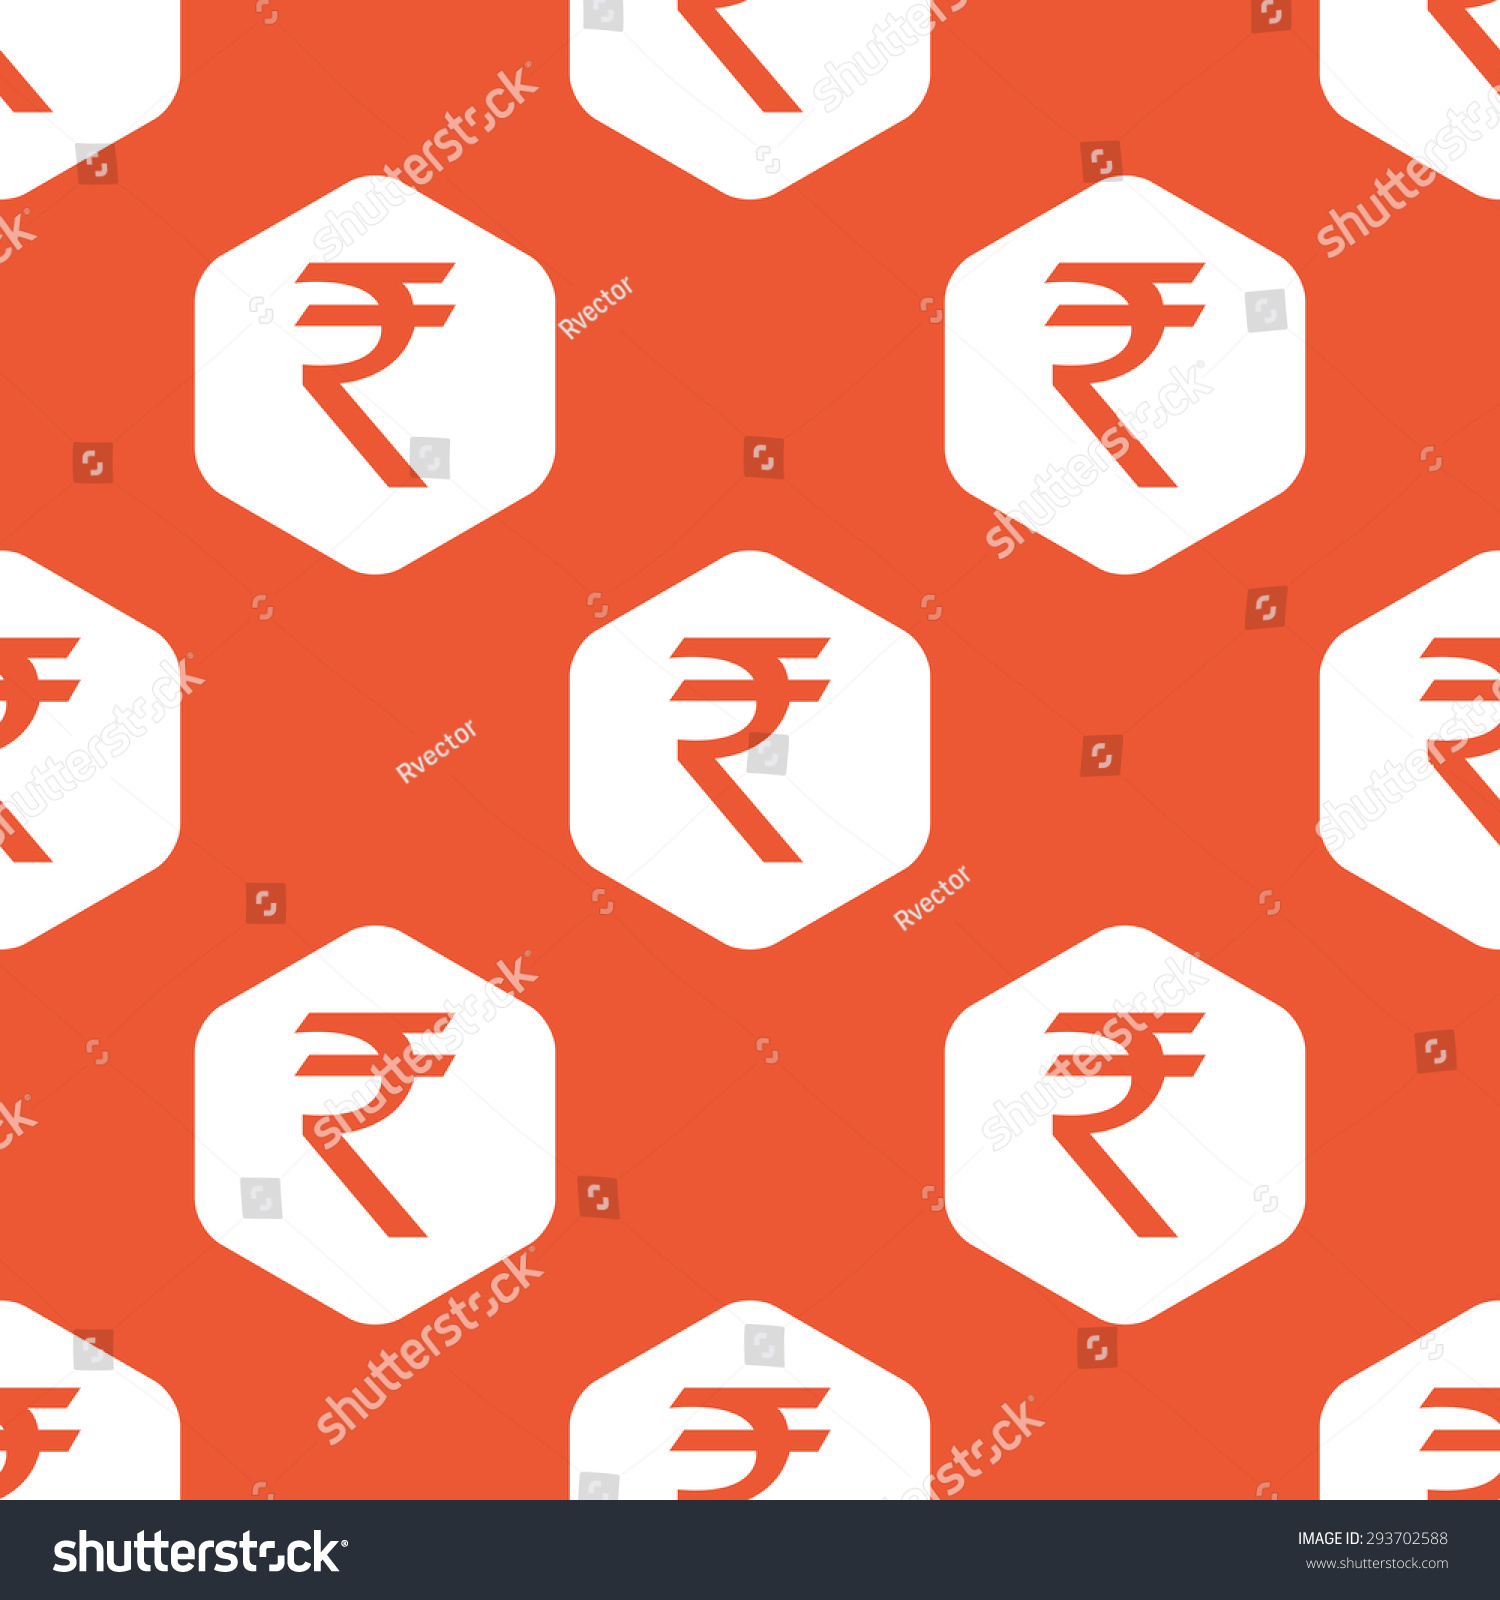 Indian rupee symbol white hexagon repeated stock vector 293702588 indian rupee symbol white hexagon repeated stock vector 293702588 shutterstock biocorpaavc Choice Image